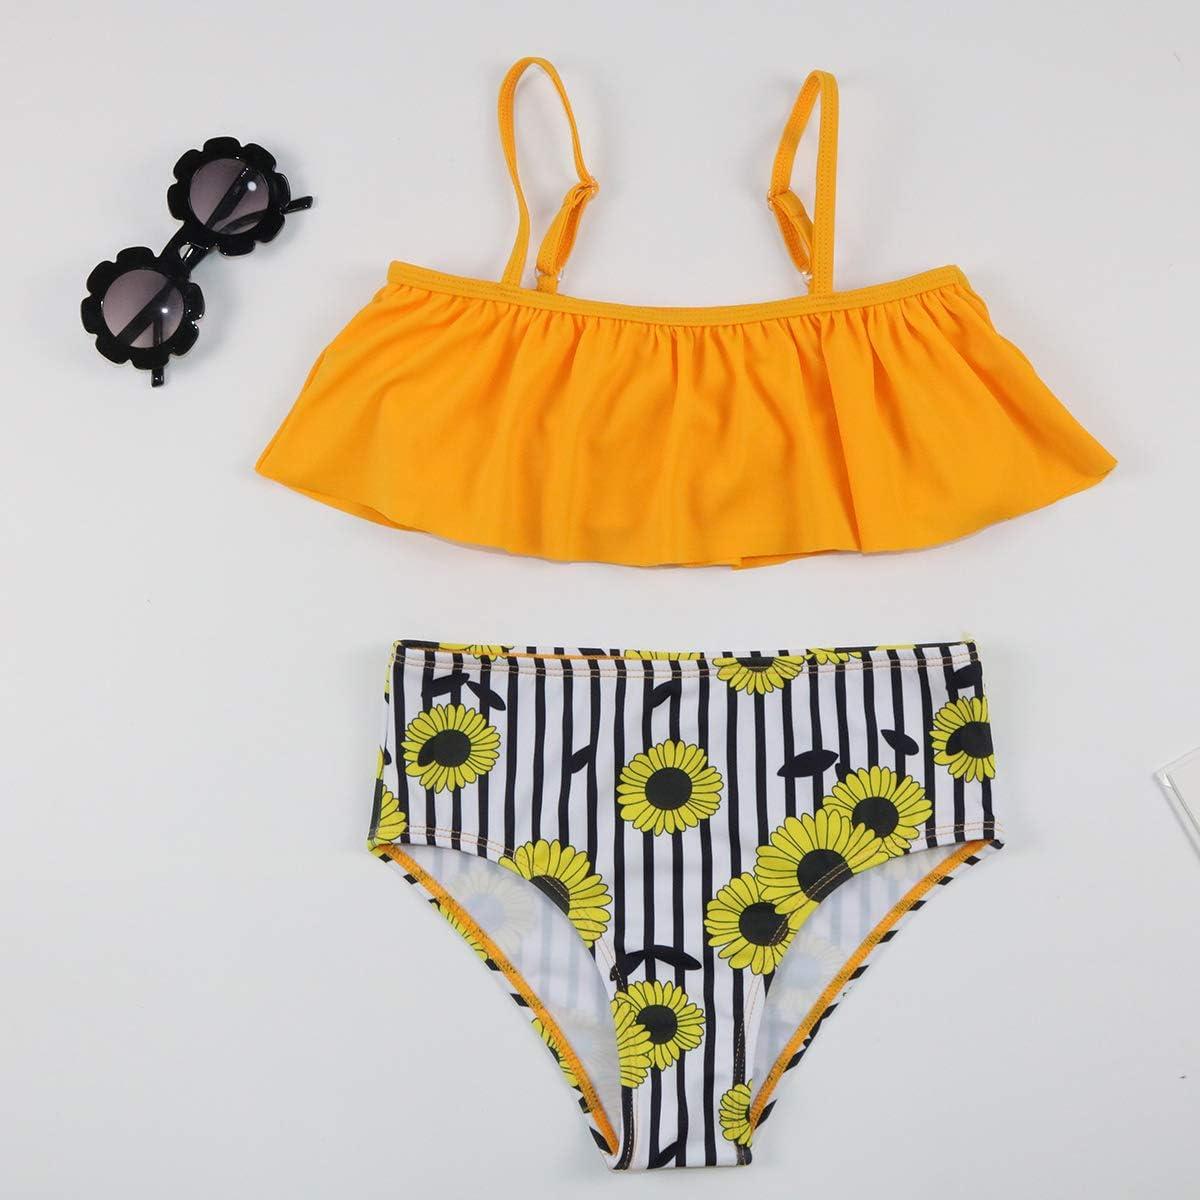 iixpin Kids Girls Summer 2PCS Bikini Set Rash Guard Tankini Spaghetti Shoulder Straps Sunflower Printed Tops with Bottoms